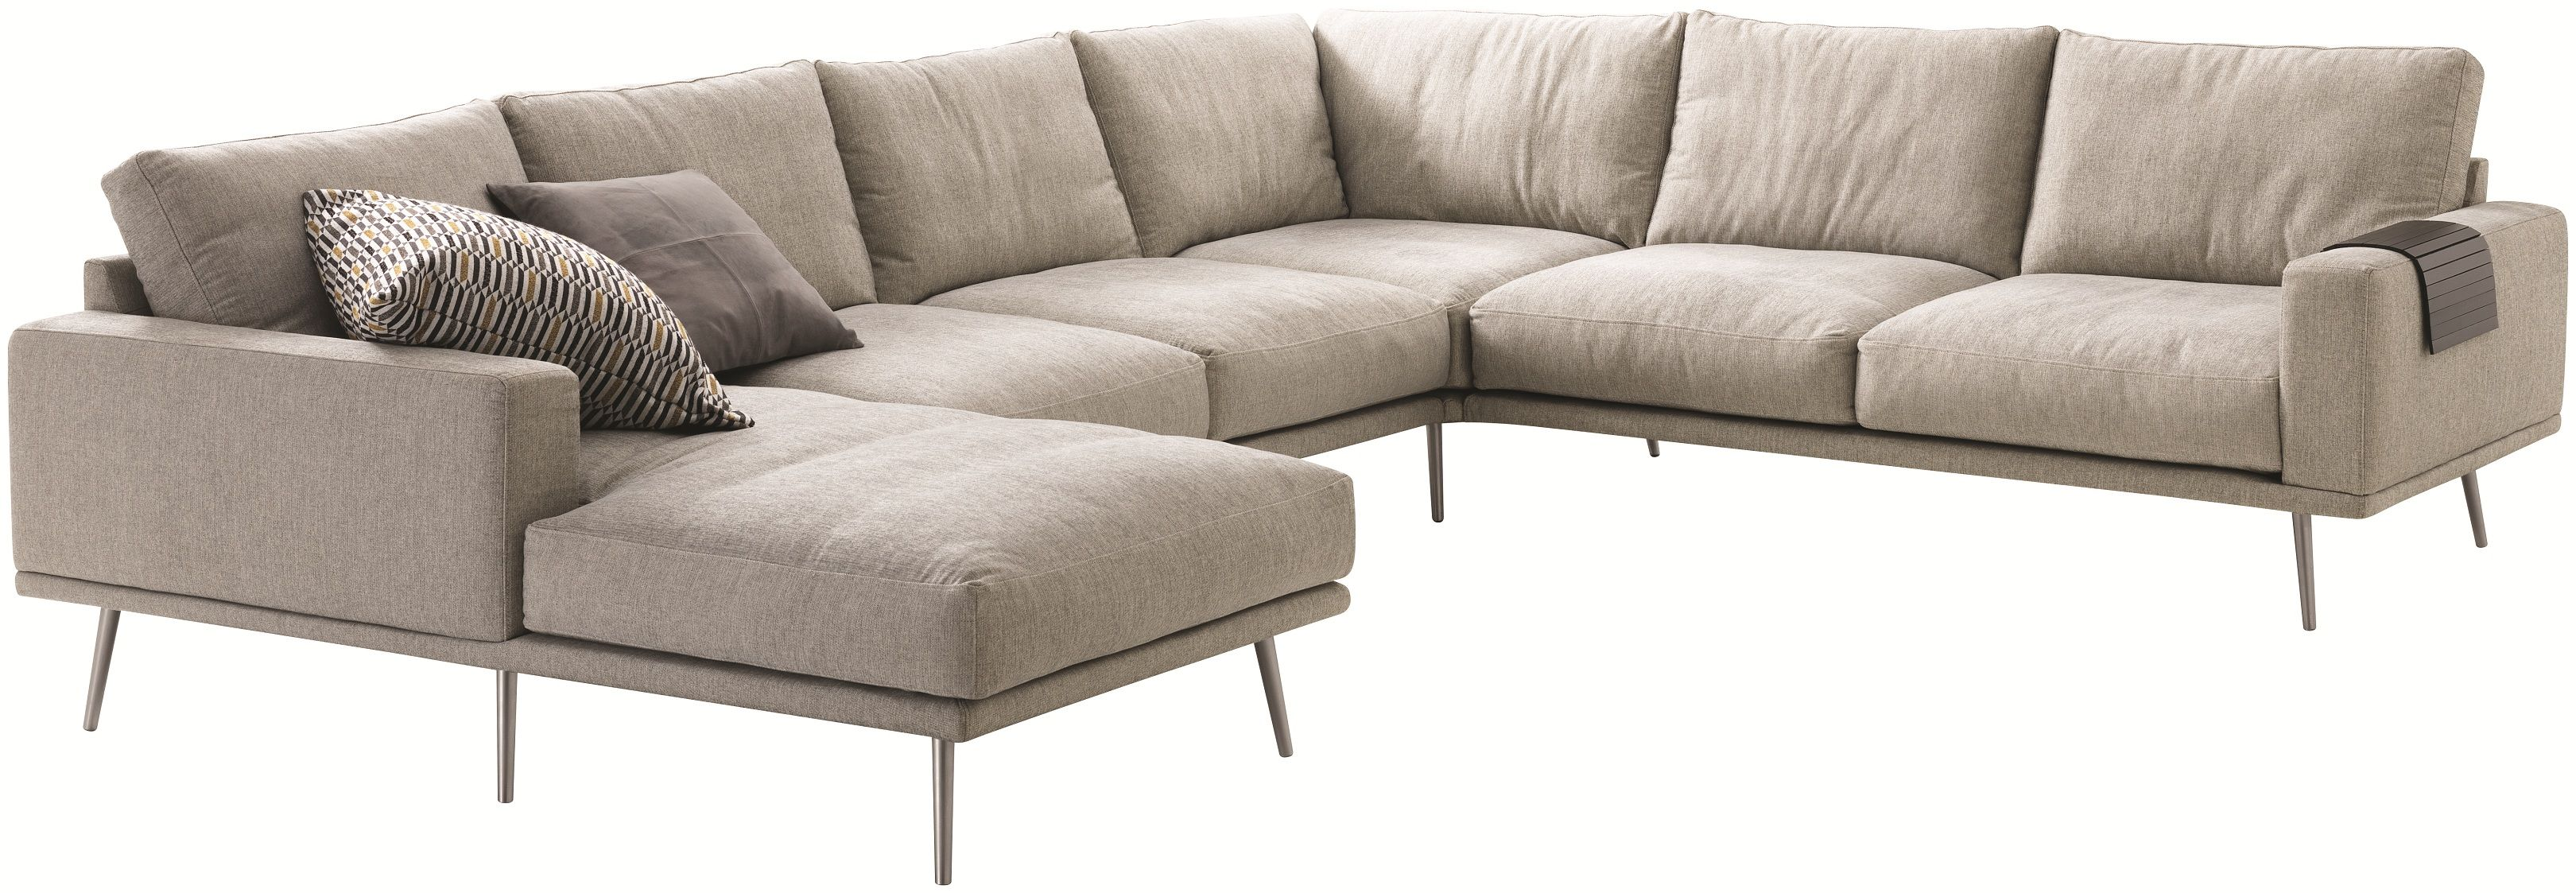 Modern Carlton Sofas Quality From Boconcept Corner Sofa Corner Sofa Design Customizable Sofa